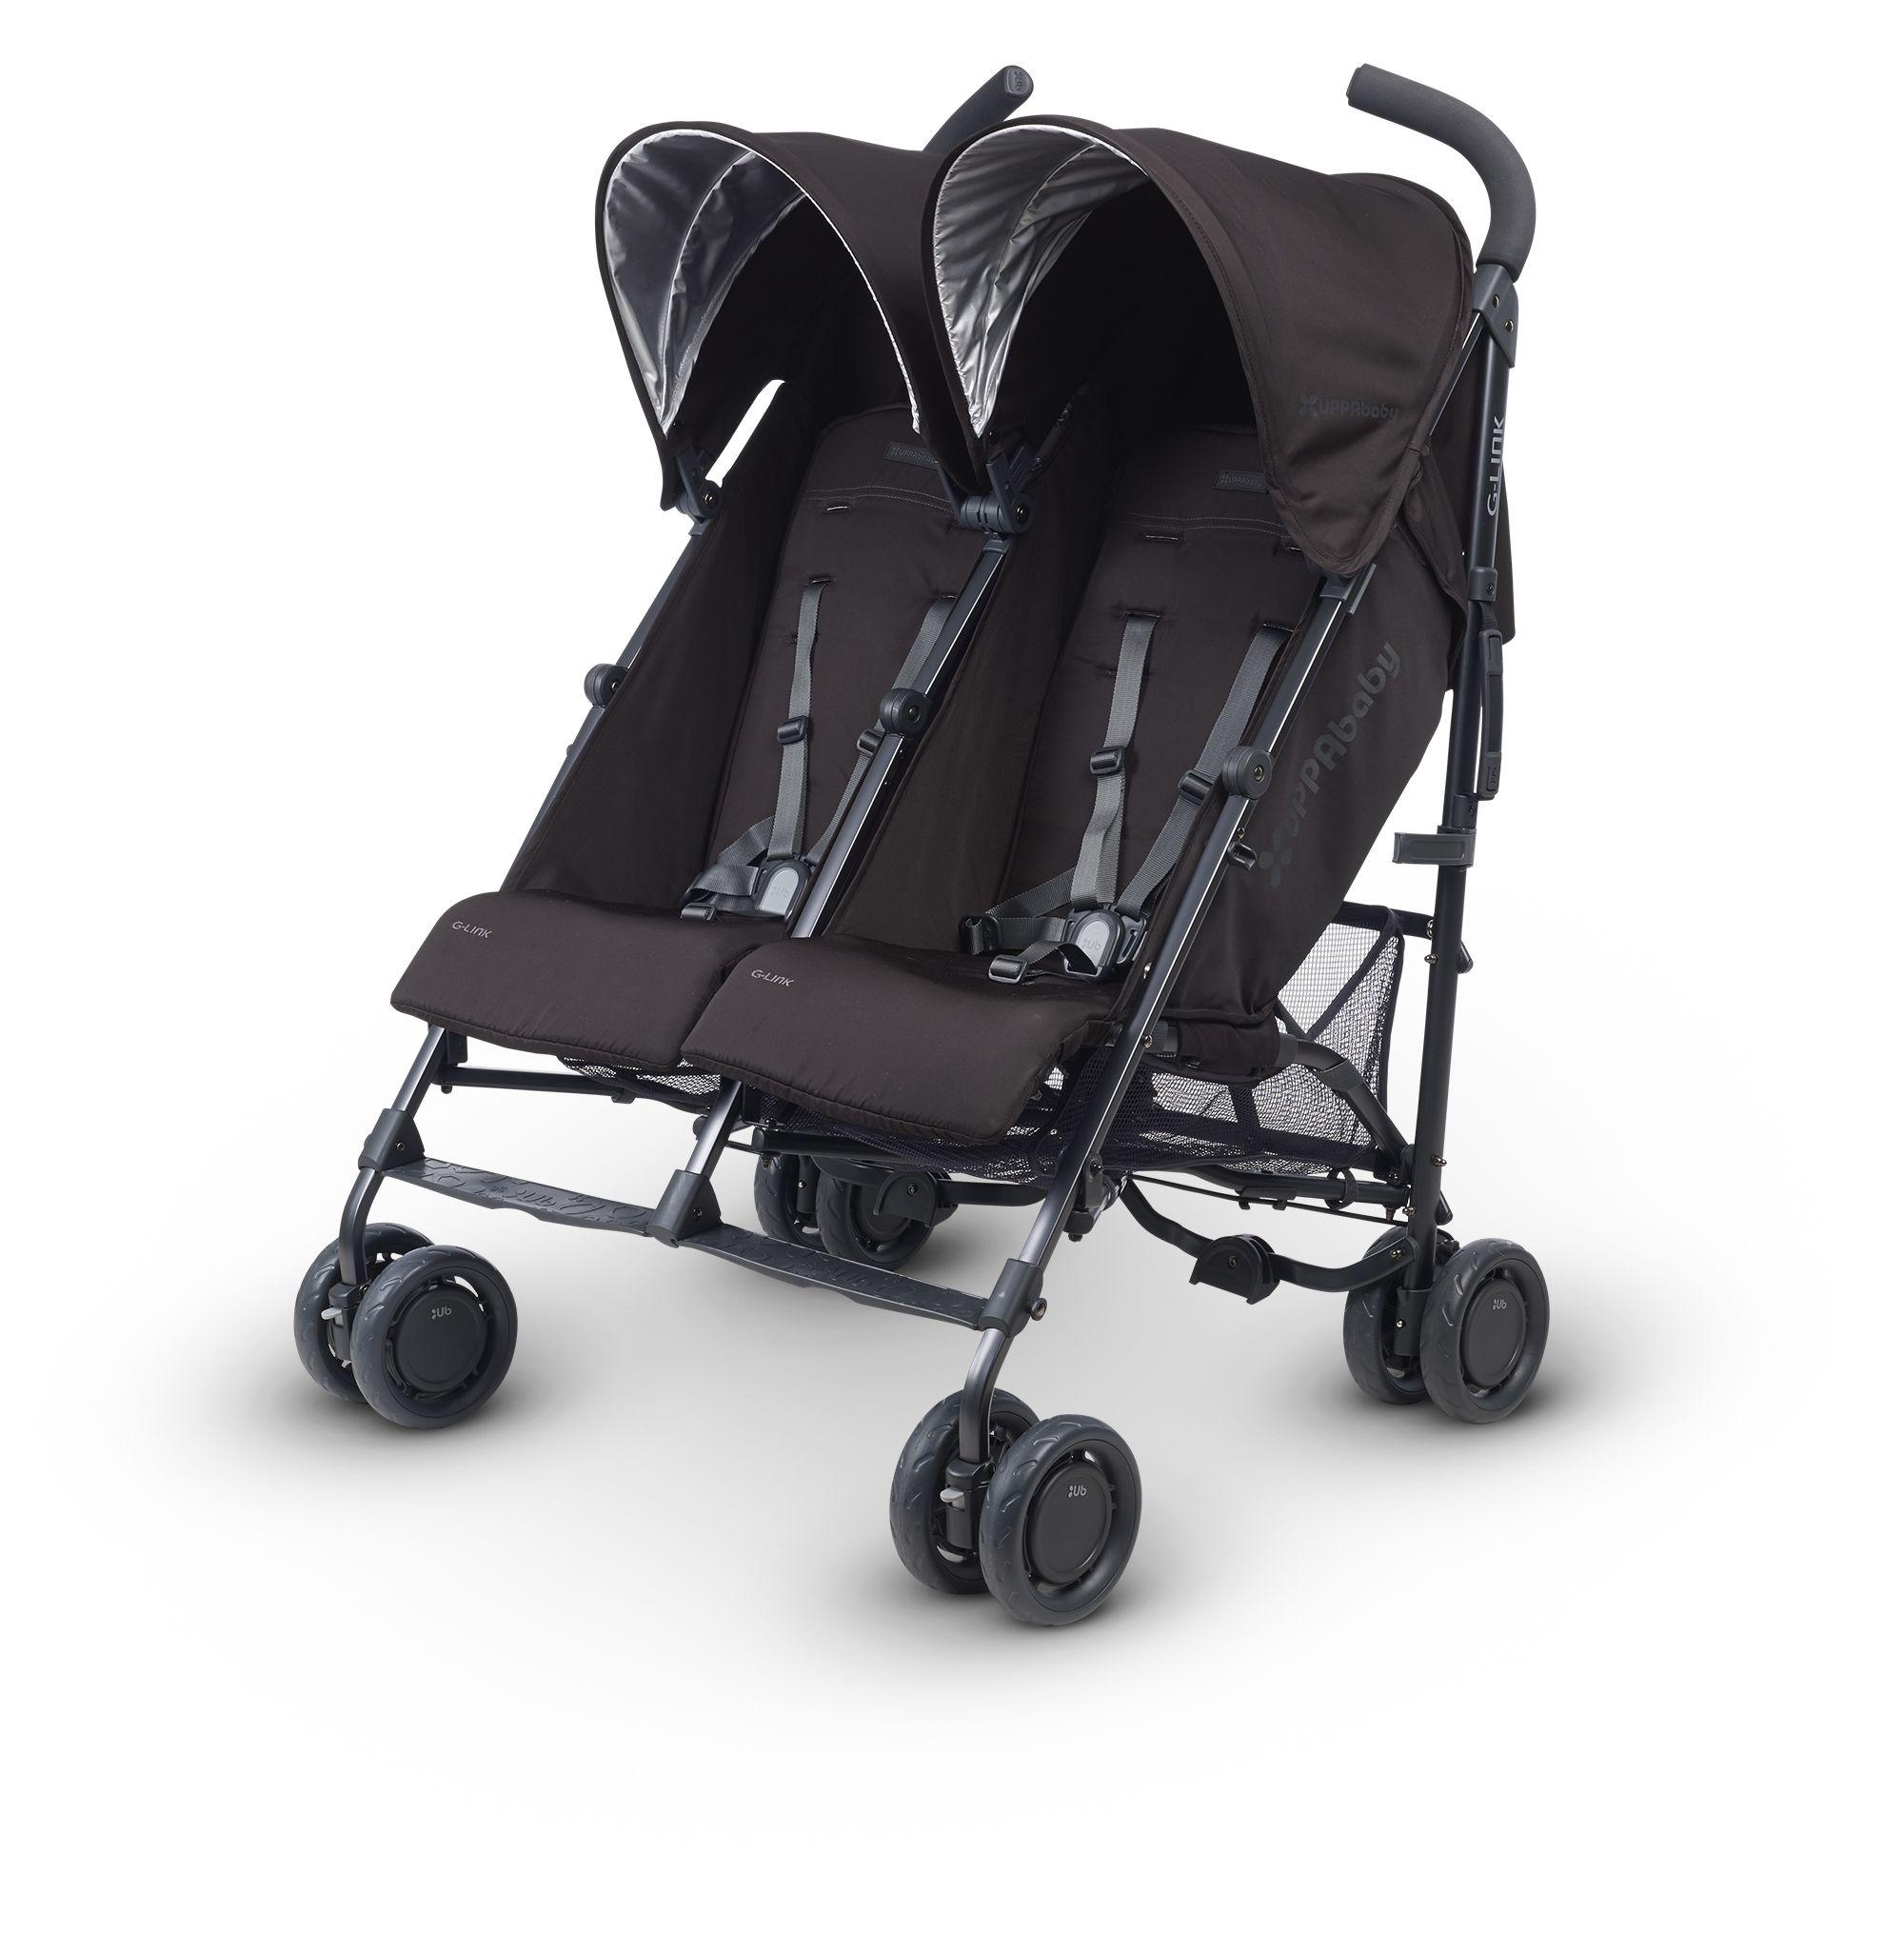 Jake GLINK Umbrella stroller, Double strollers, Baby